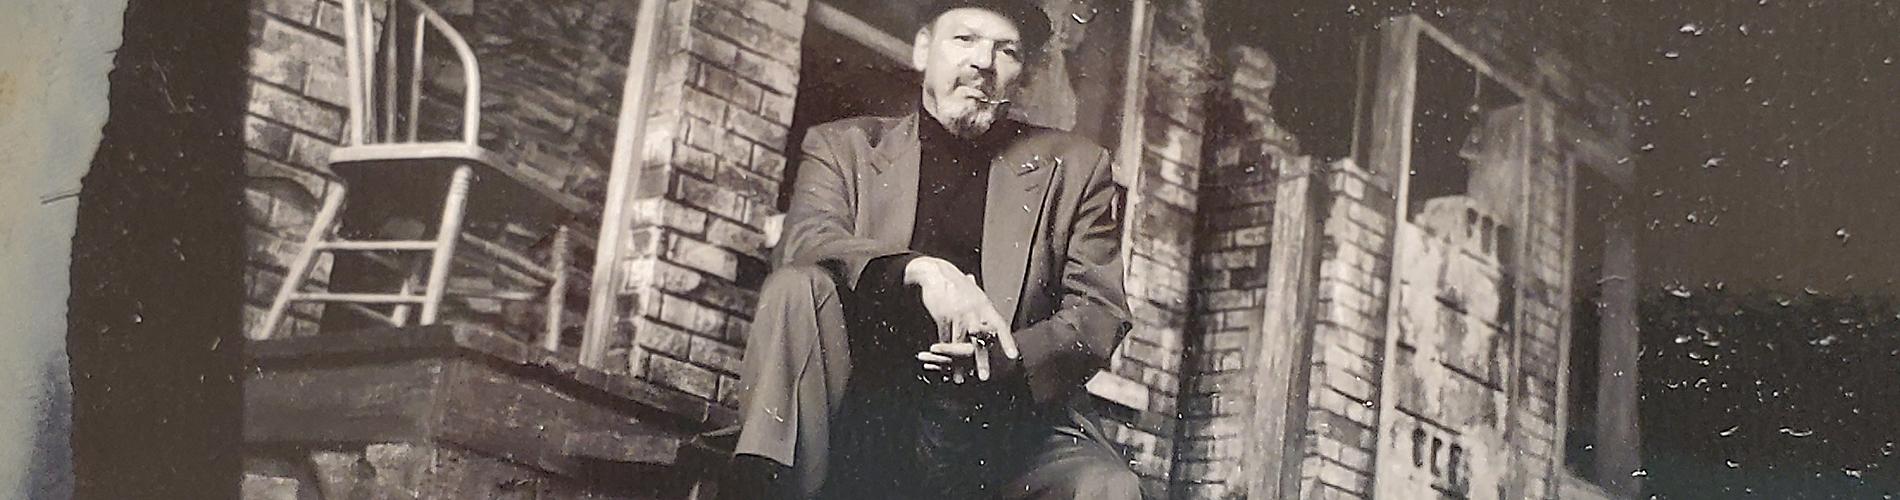 August Wilson sitting on steps.